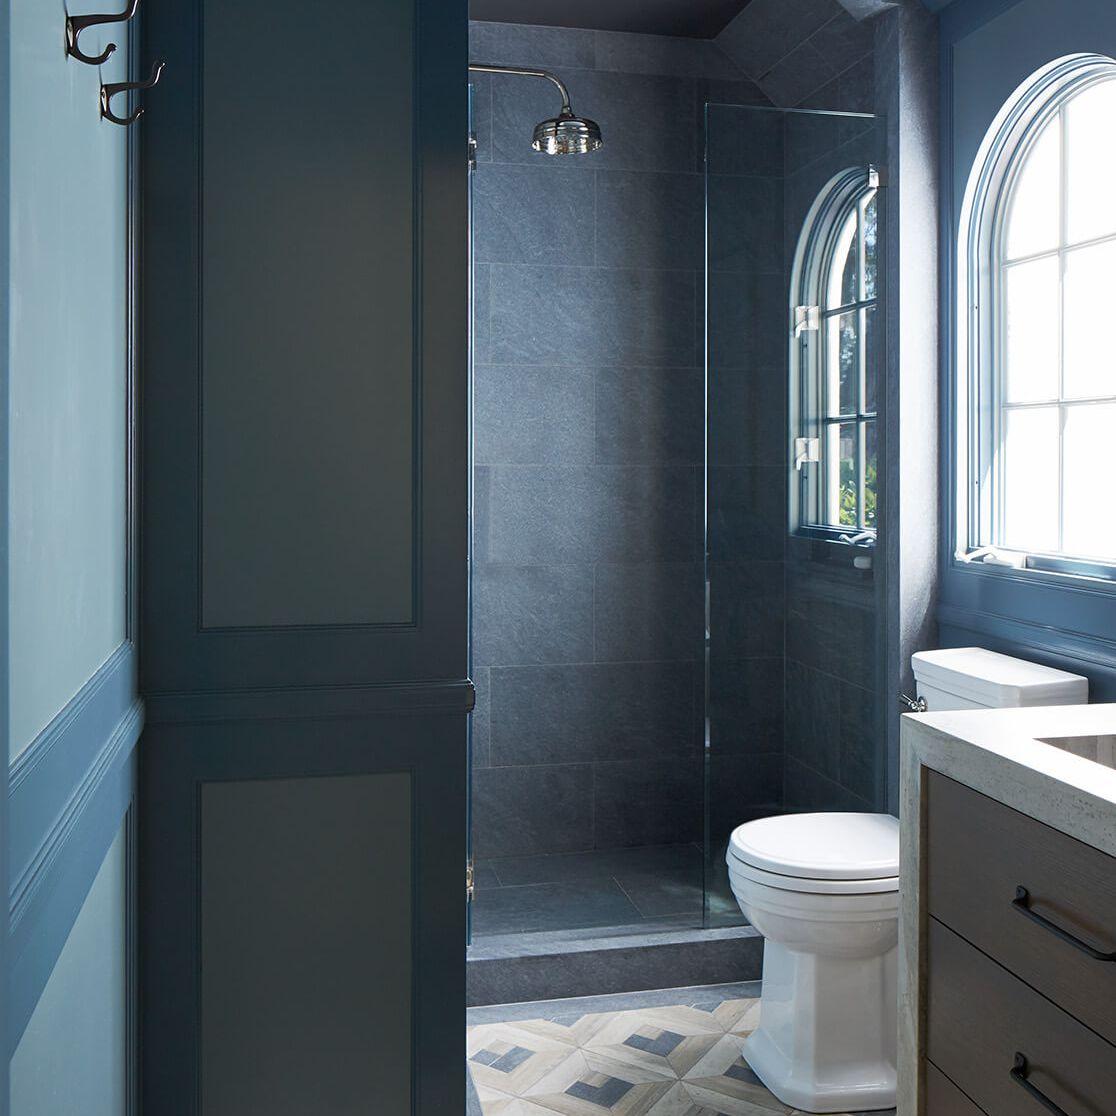 Traditional meets modern, blue-tiled bathroom